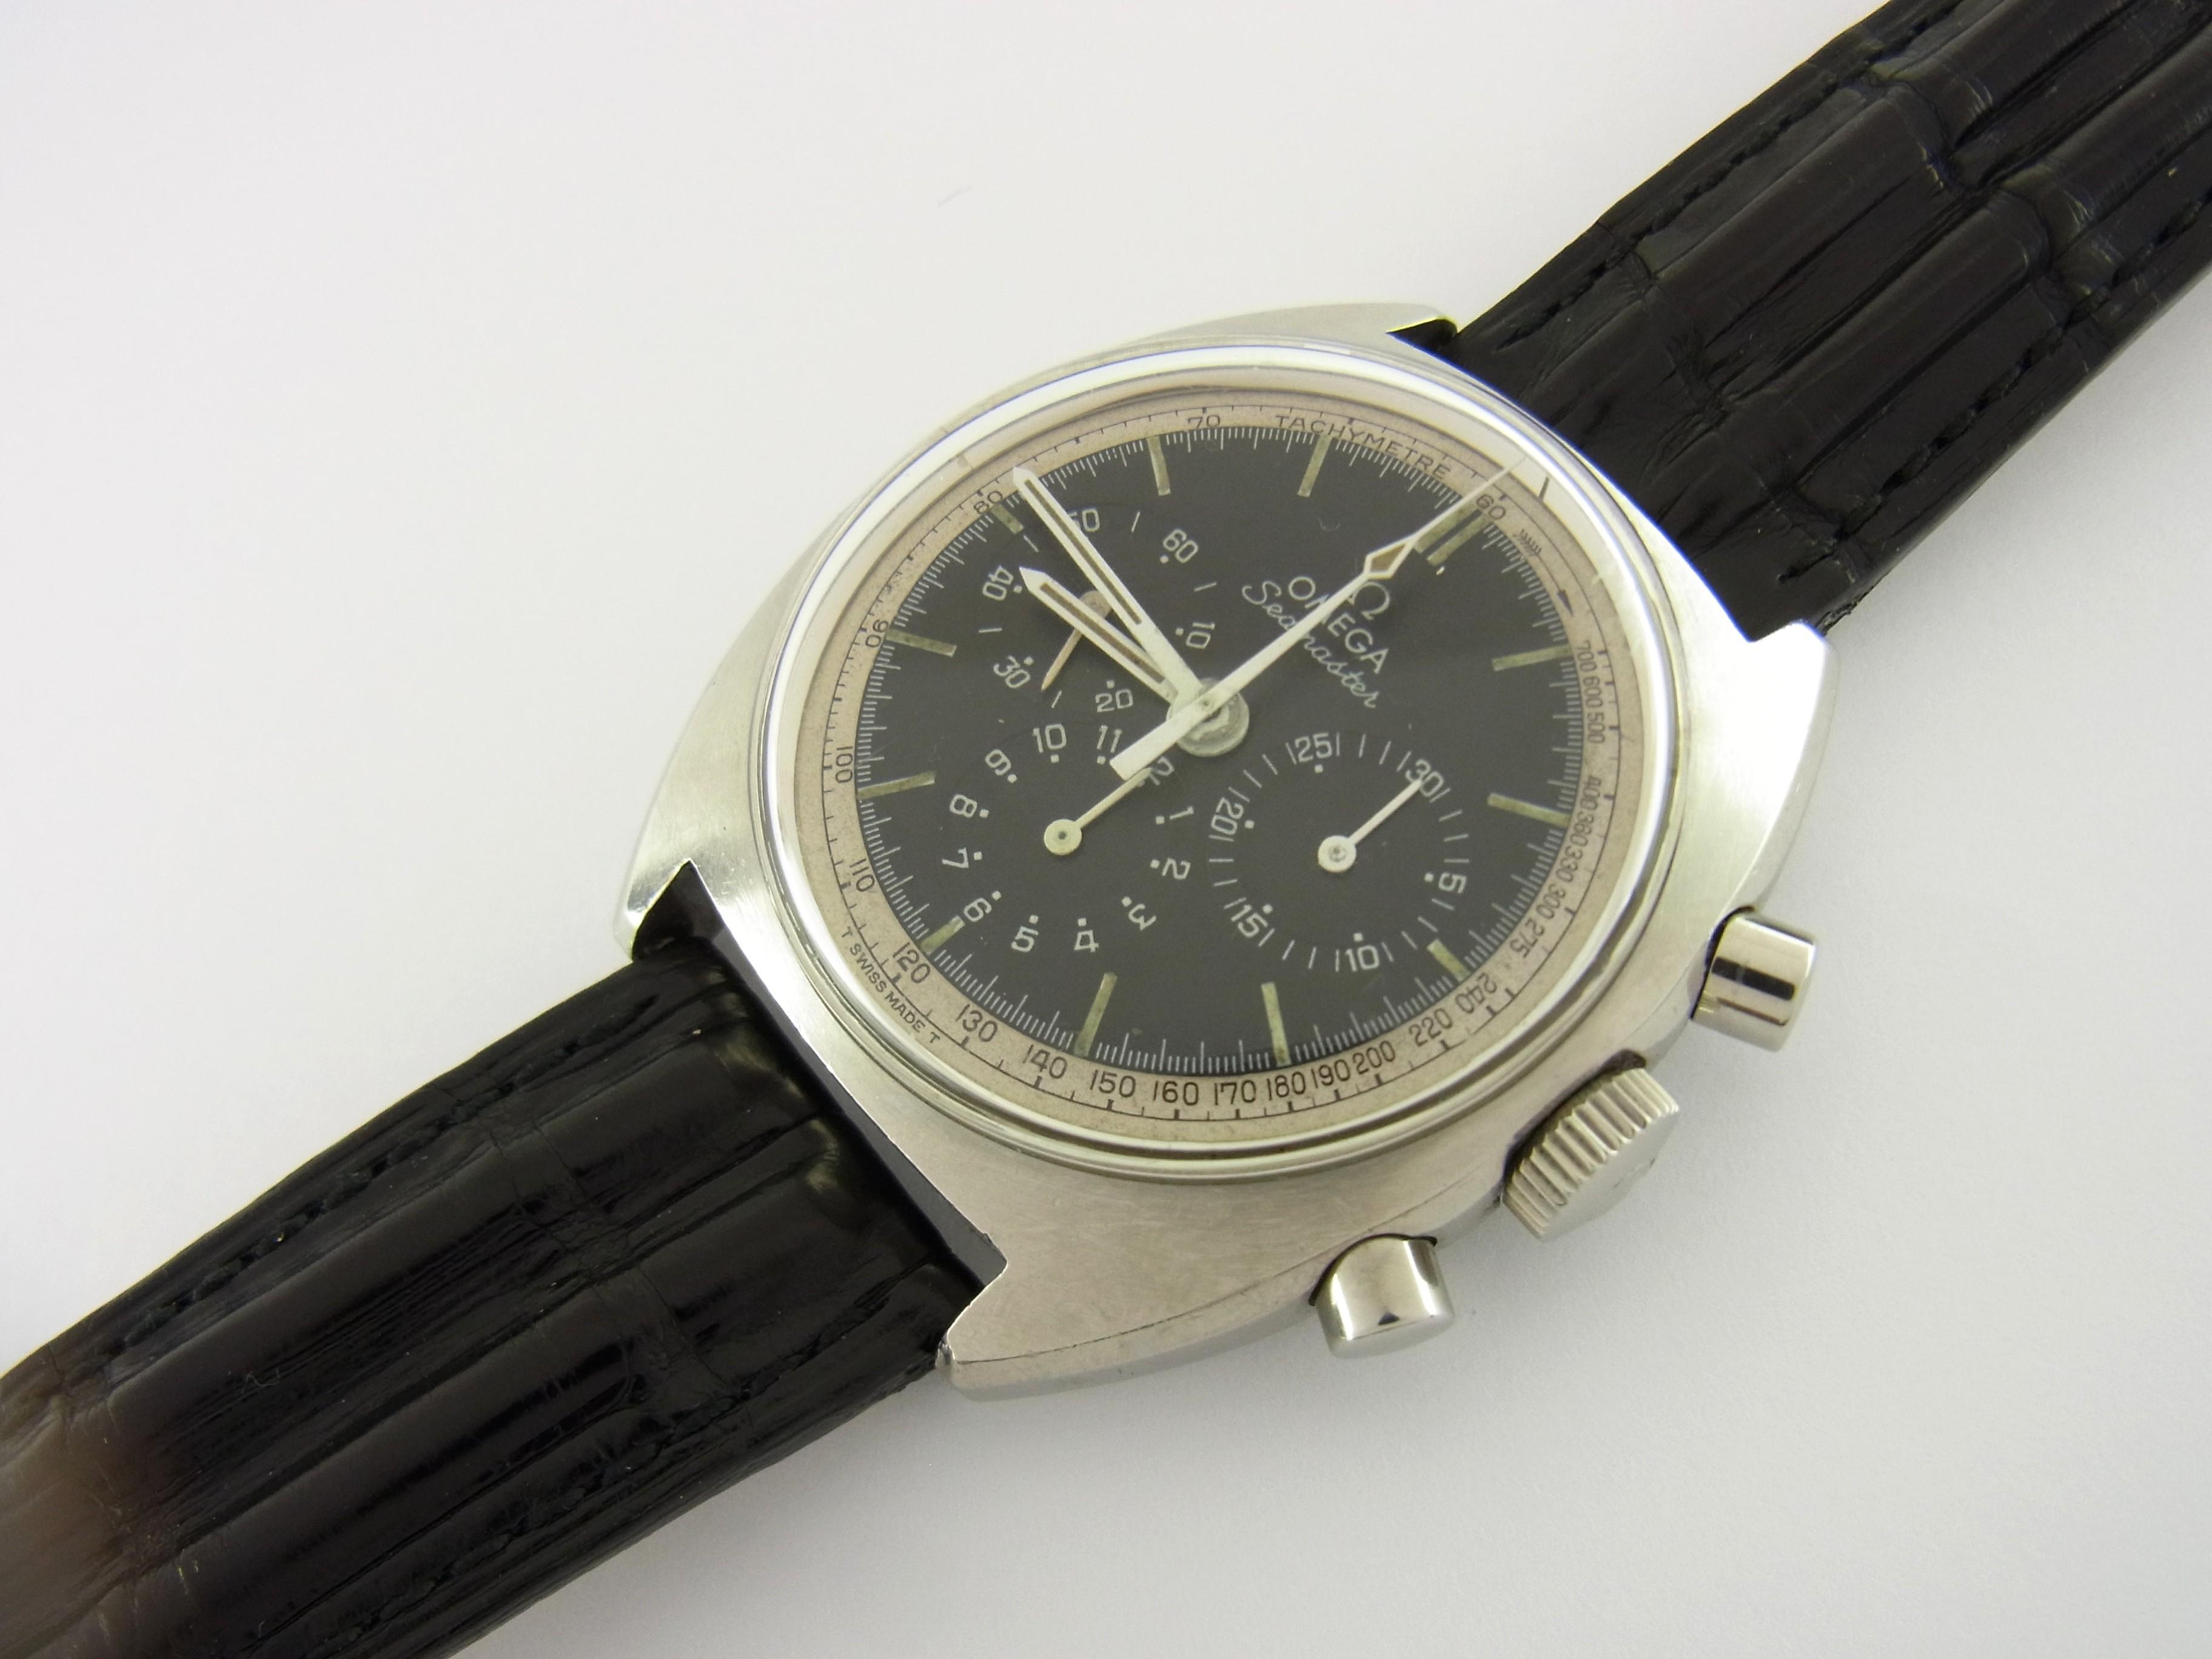 omega seamaster chronograph ref sammleruhr aus 1966 uhren online shop luxini. Black Bedroom Furniture Sets. Home Design Ideas